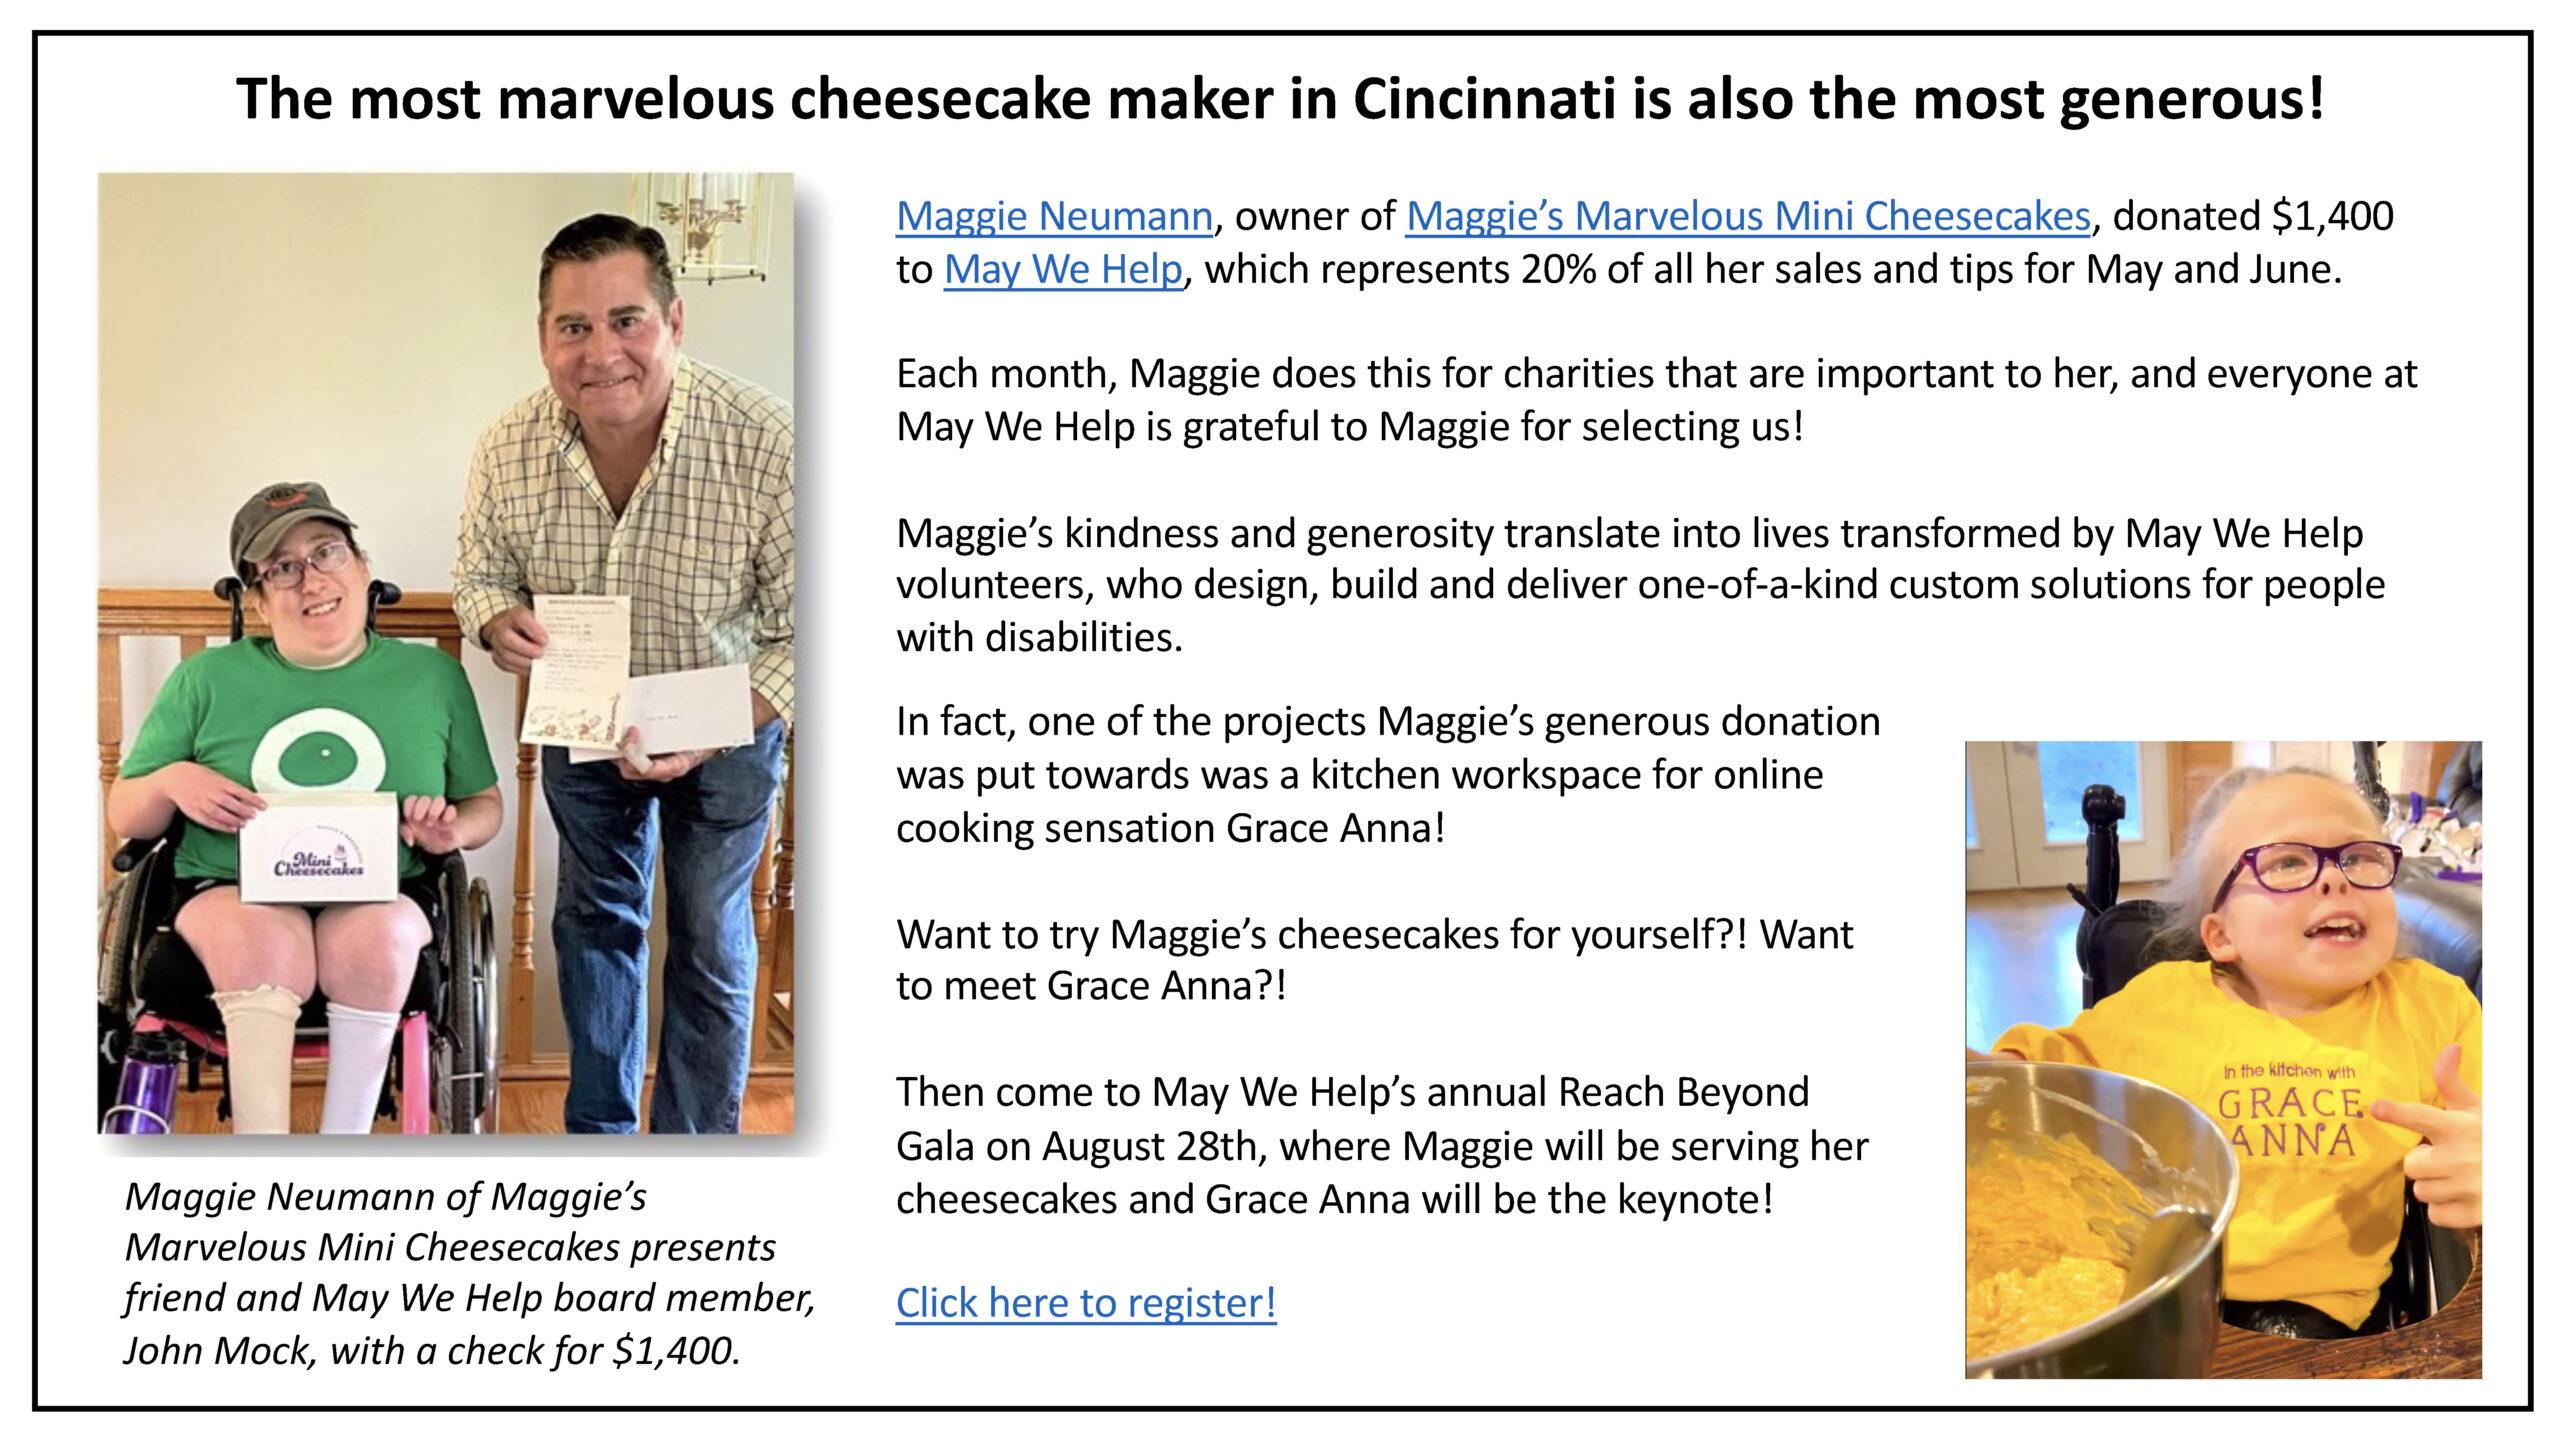 Mini Cheesecake Maker Donates Big!